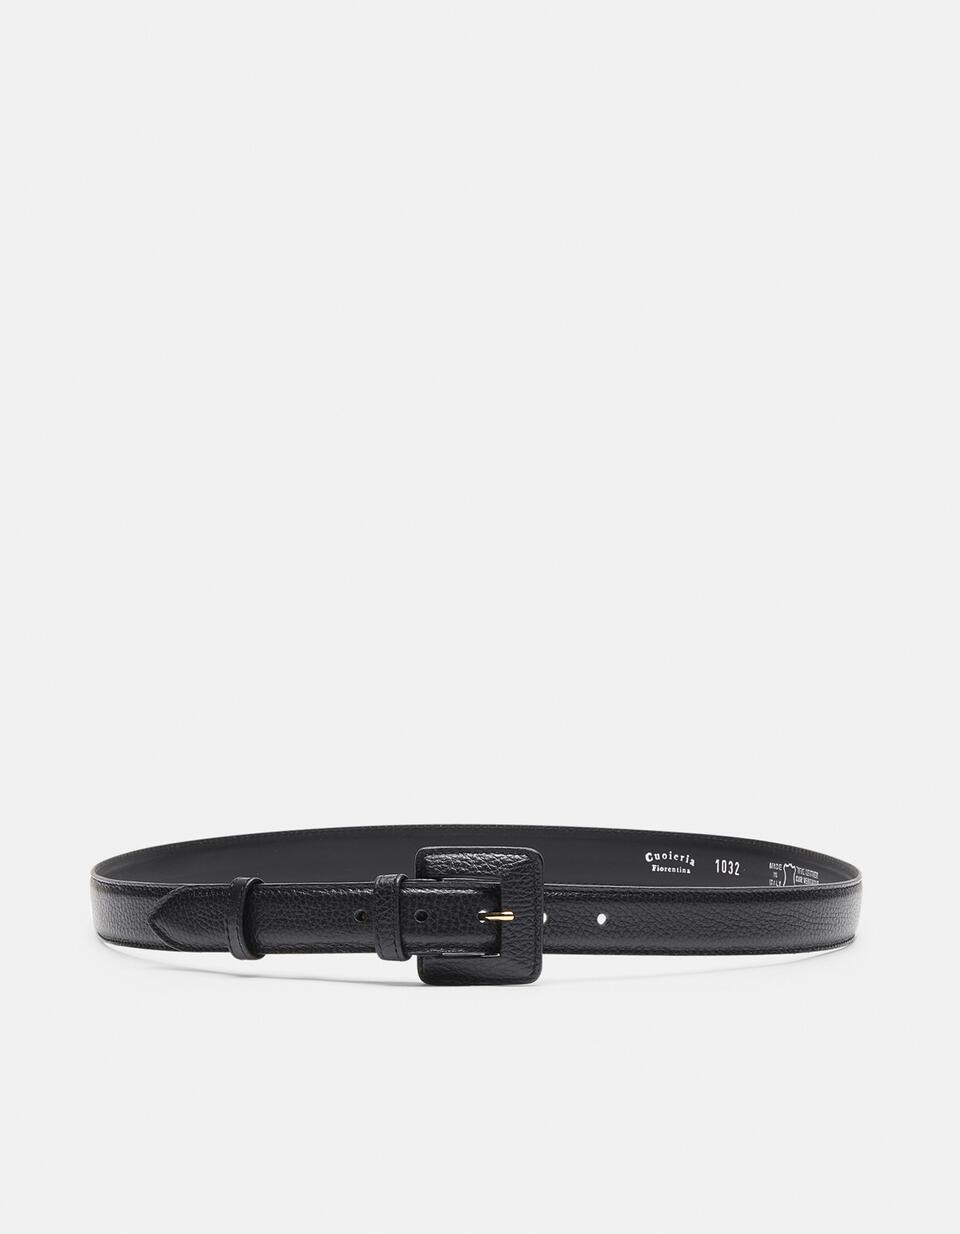 Velvet Cintura con fibbia fasciata NERO Cuoieria Fiorentina